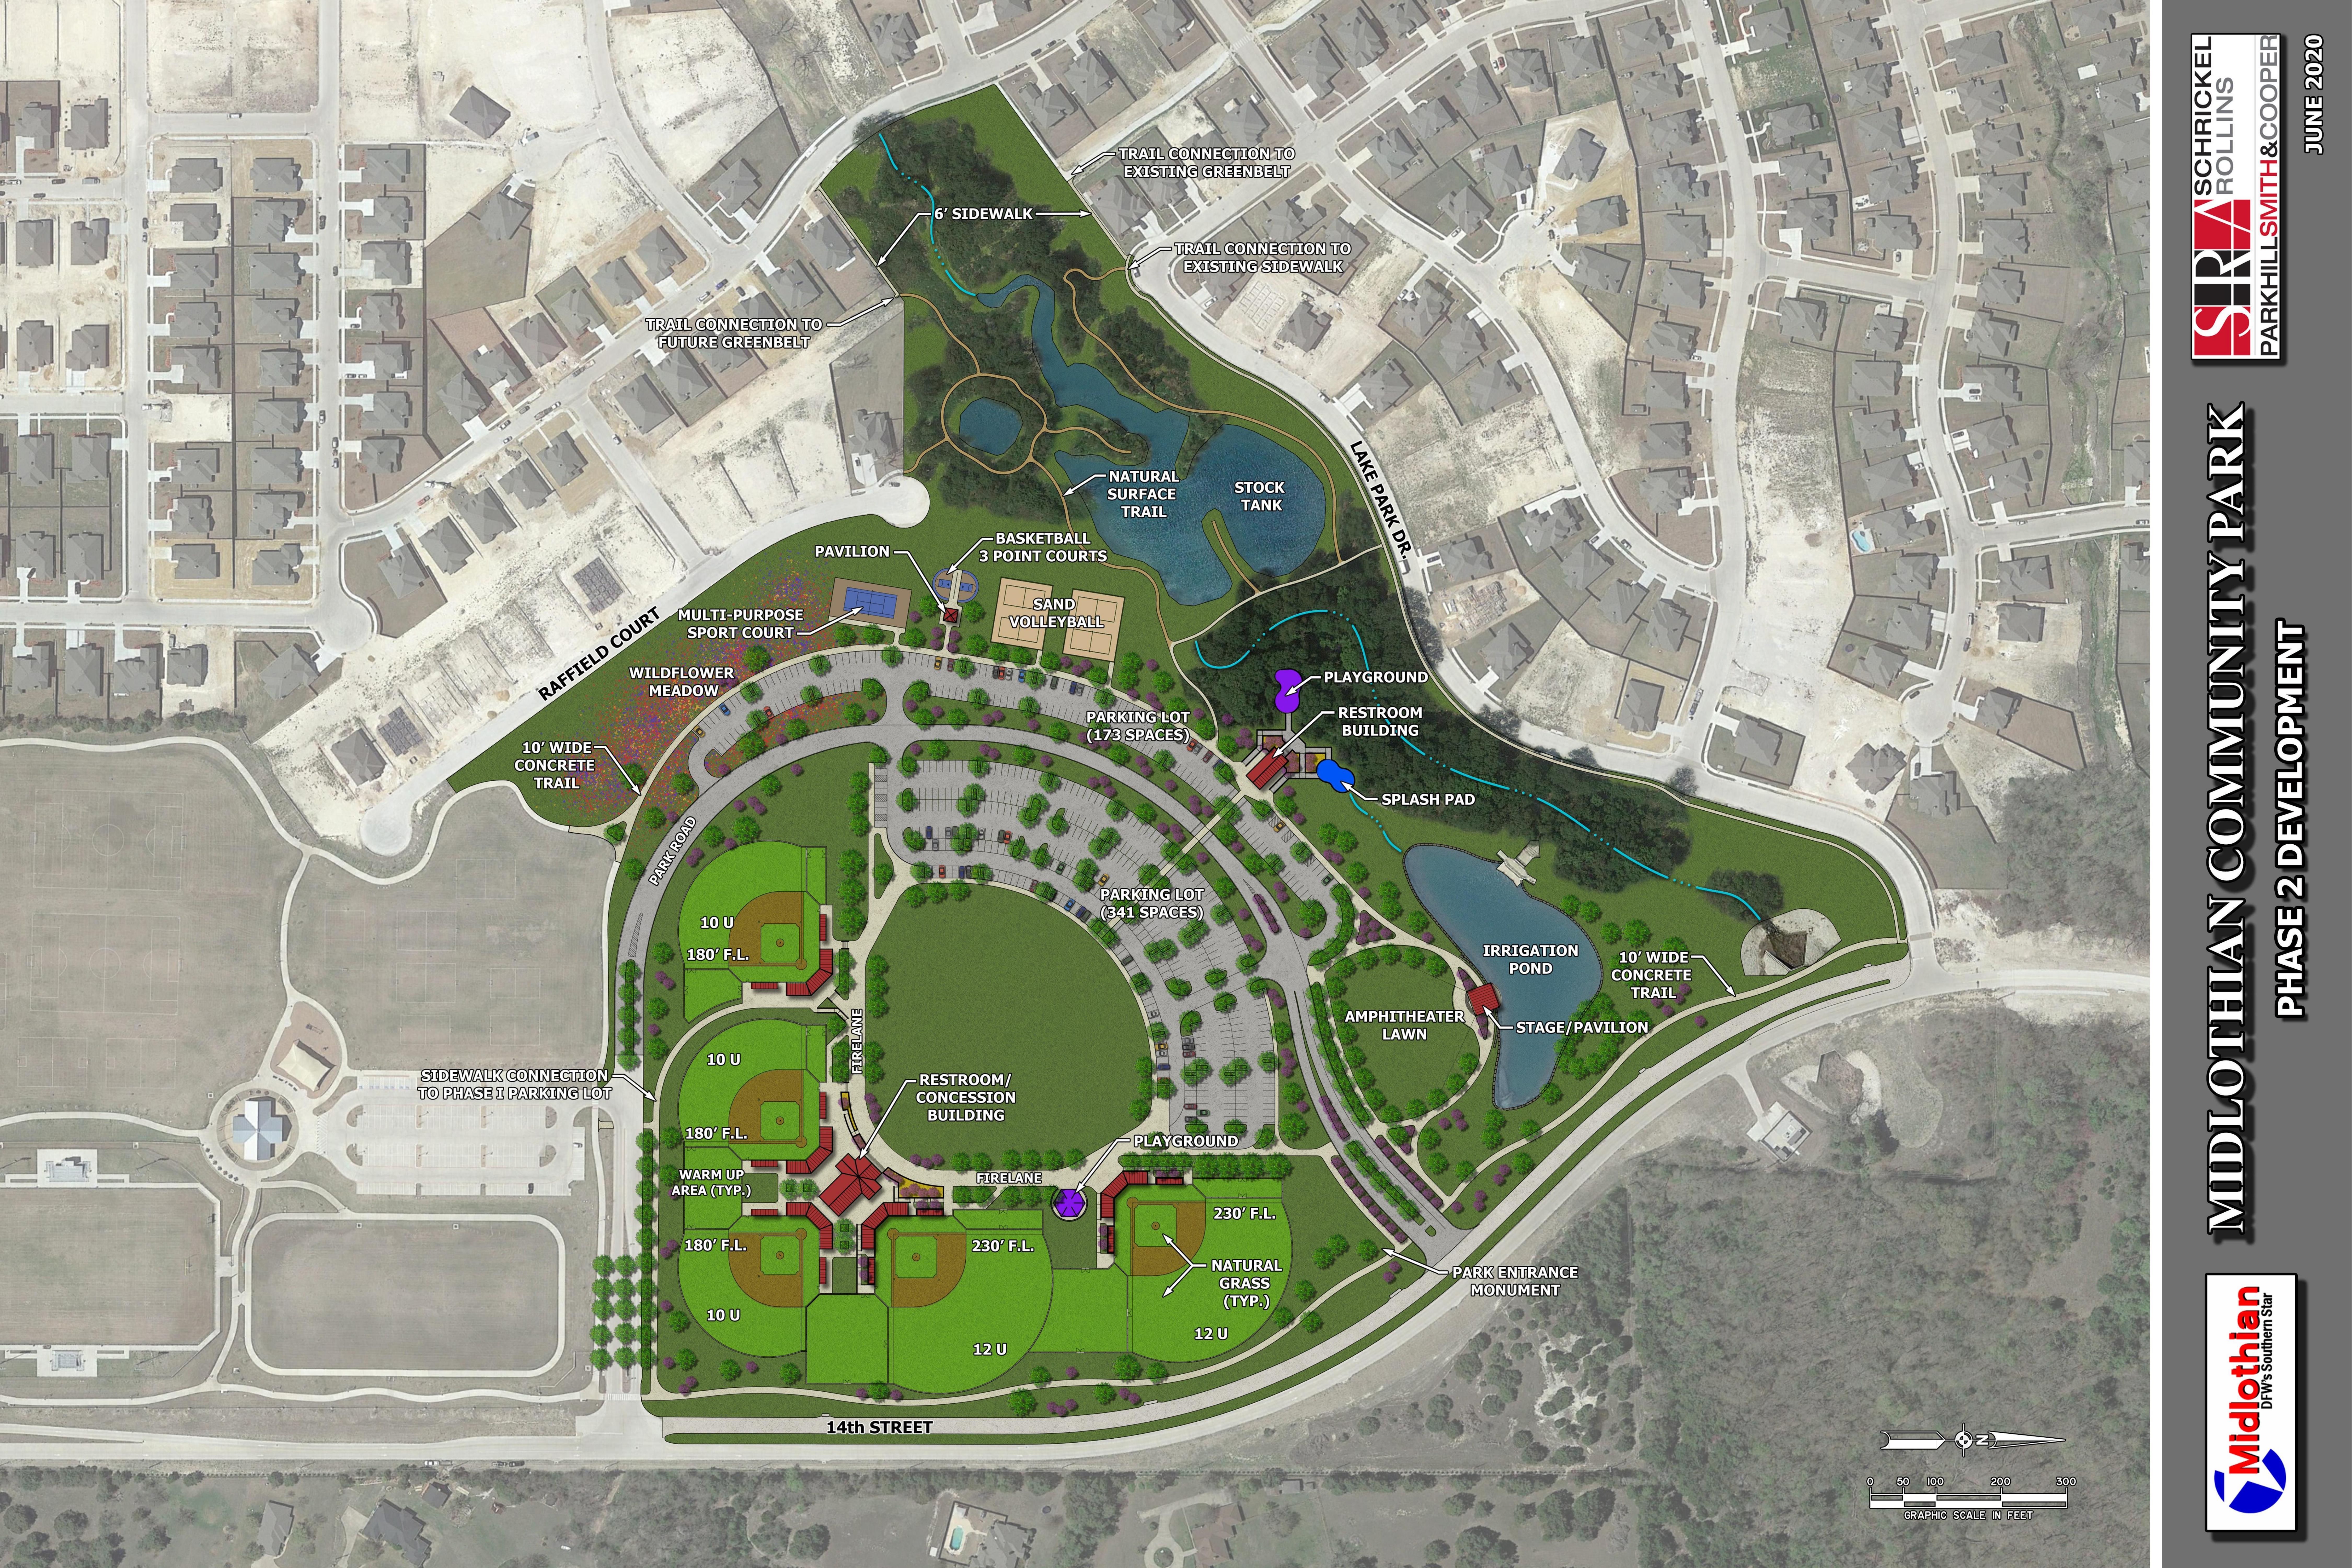 Midlothian Community Park Master Plan